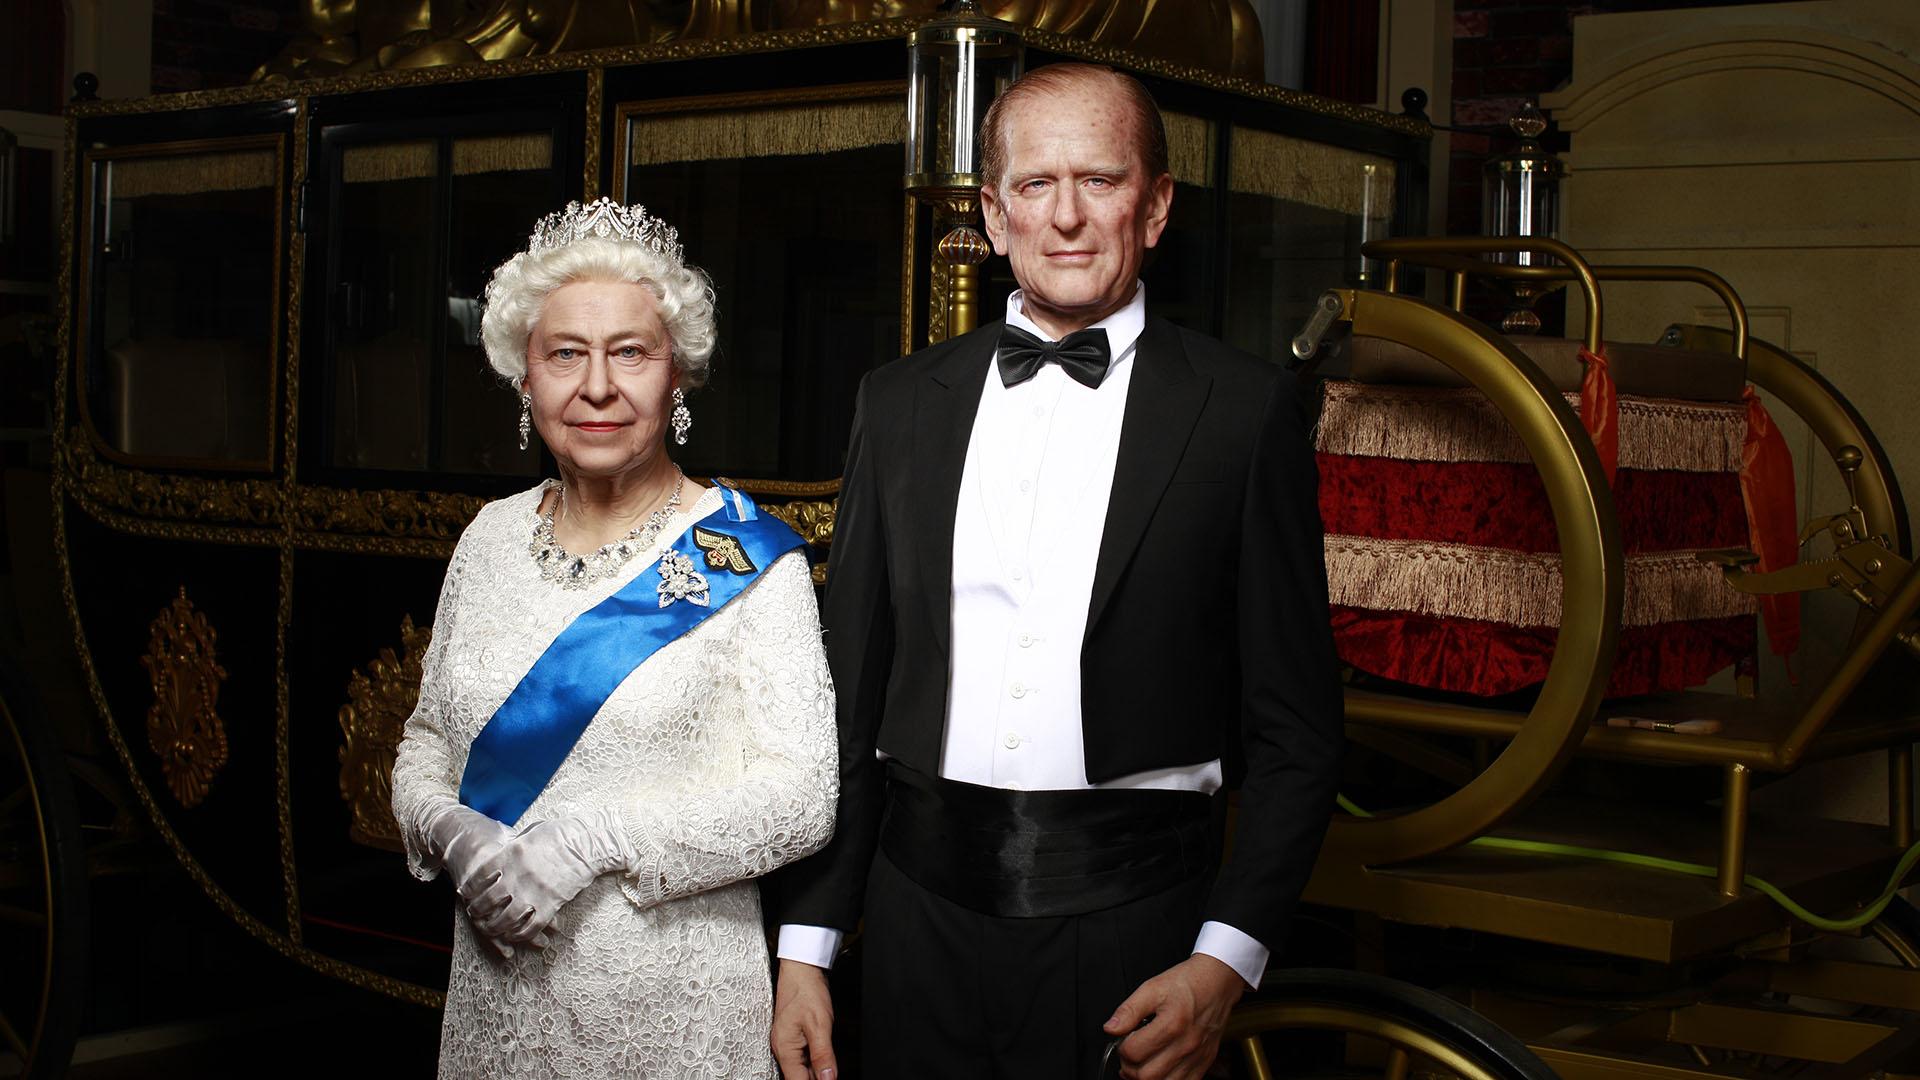 रानी एलिजाबेथ राजनीतिक जीवनशैली सिलिकॉन वैक्स मूर्तियां